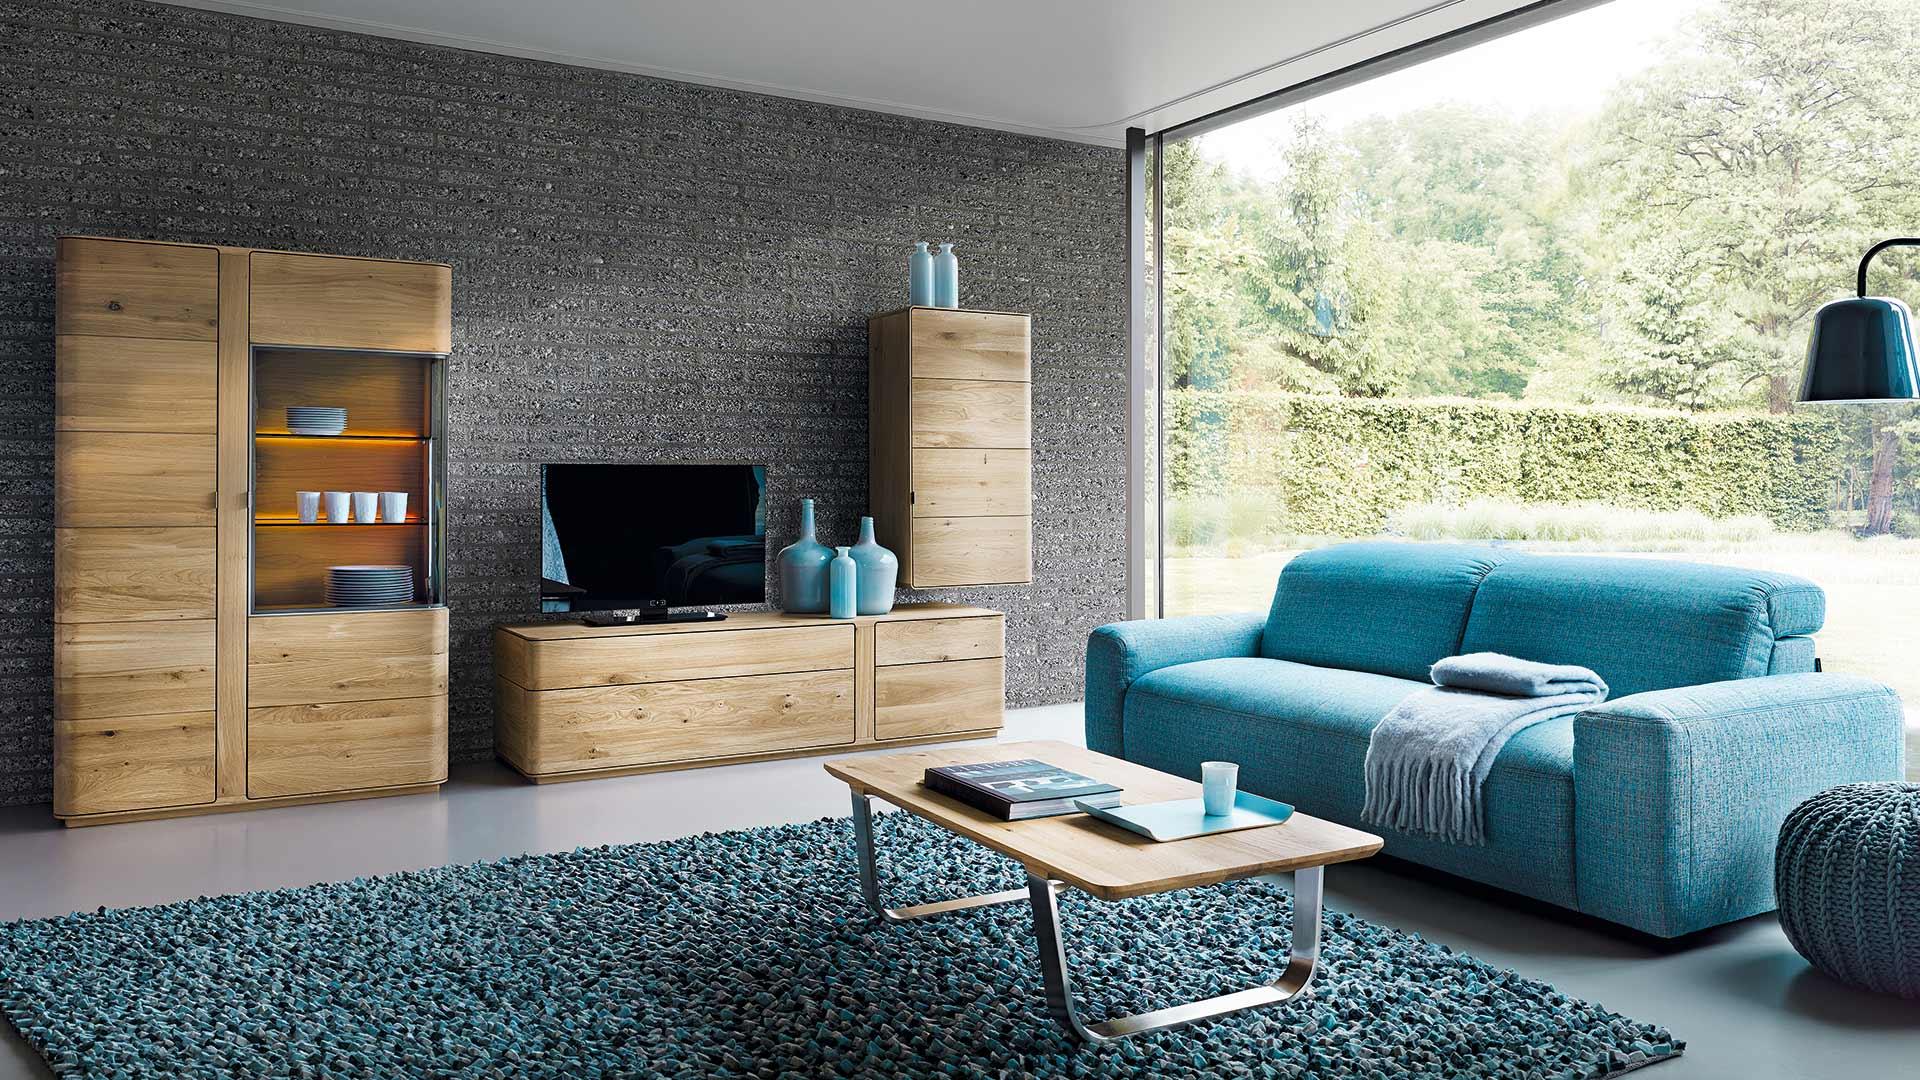 contur 5900 von contur einrichtungen in bad s ckingen nahe basel m bel beck. Black Bedroom Furniture Sets. Home Design Ideas